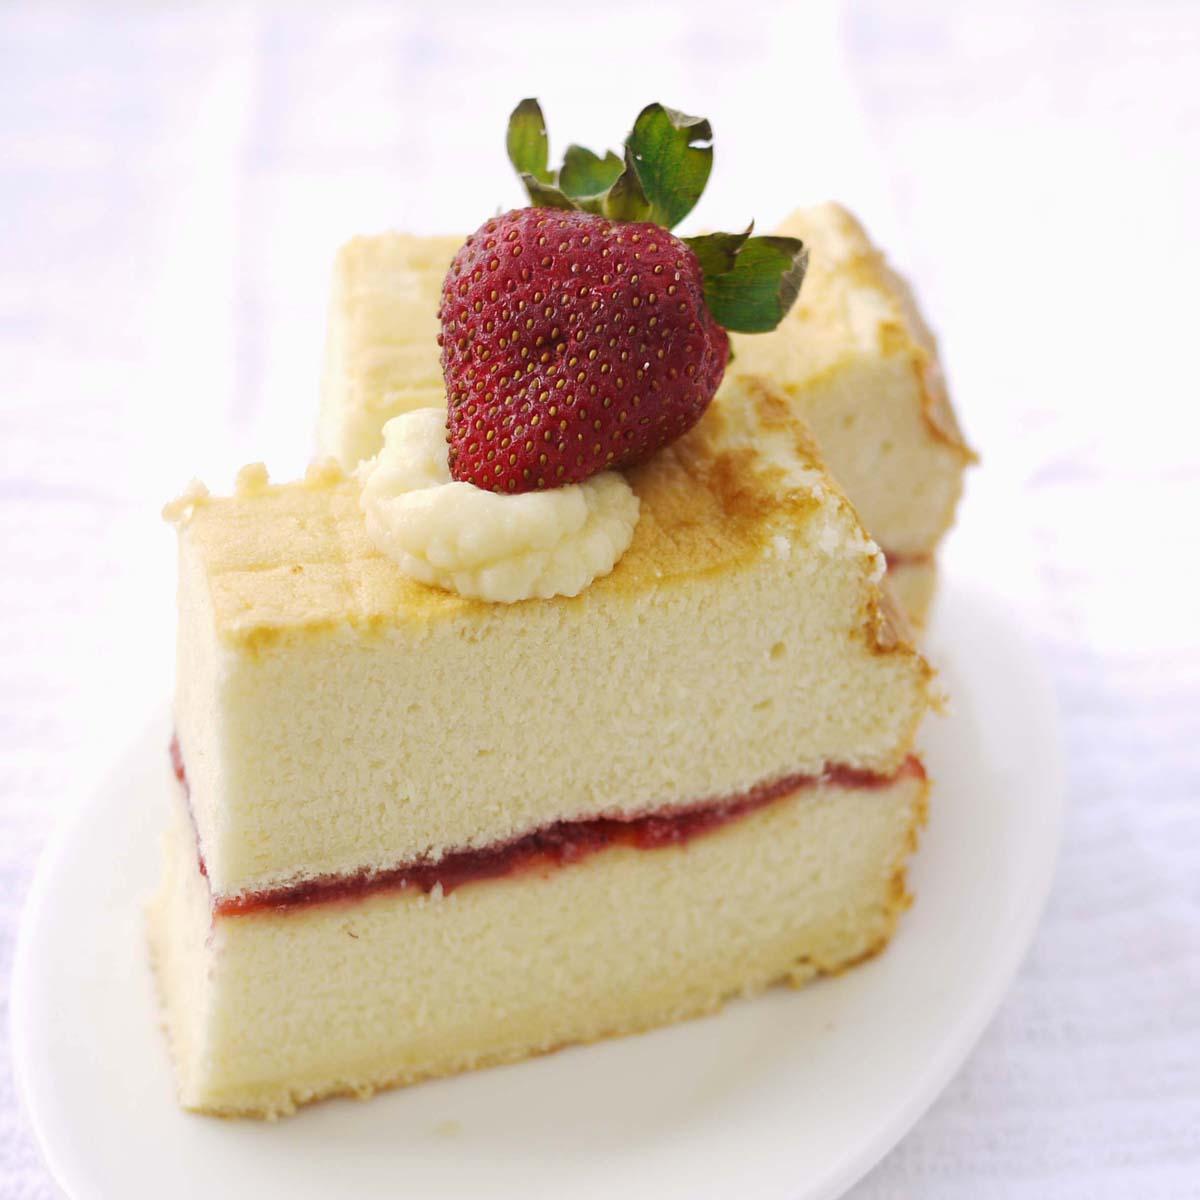 Sponge Cake Crustabakes